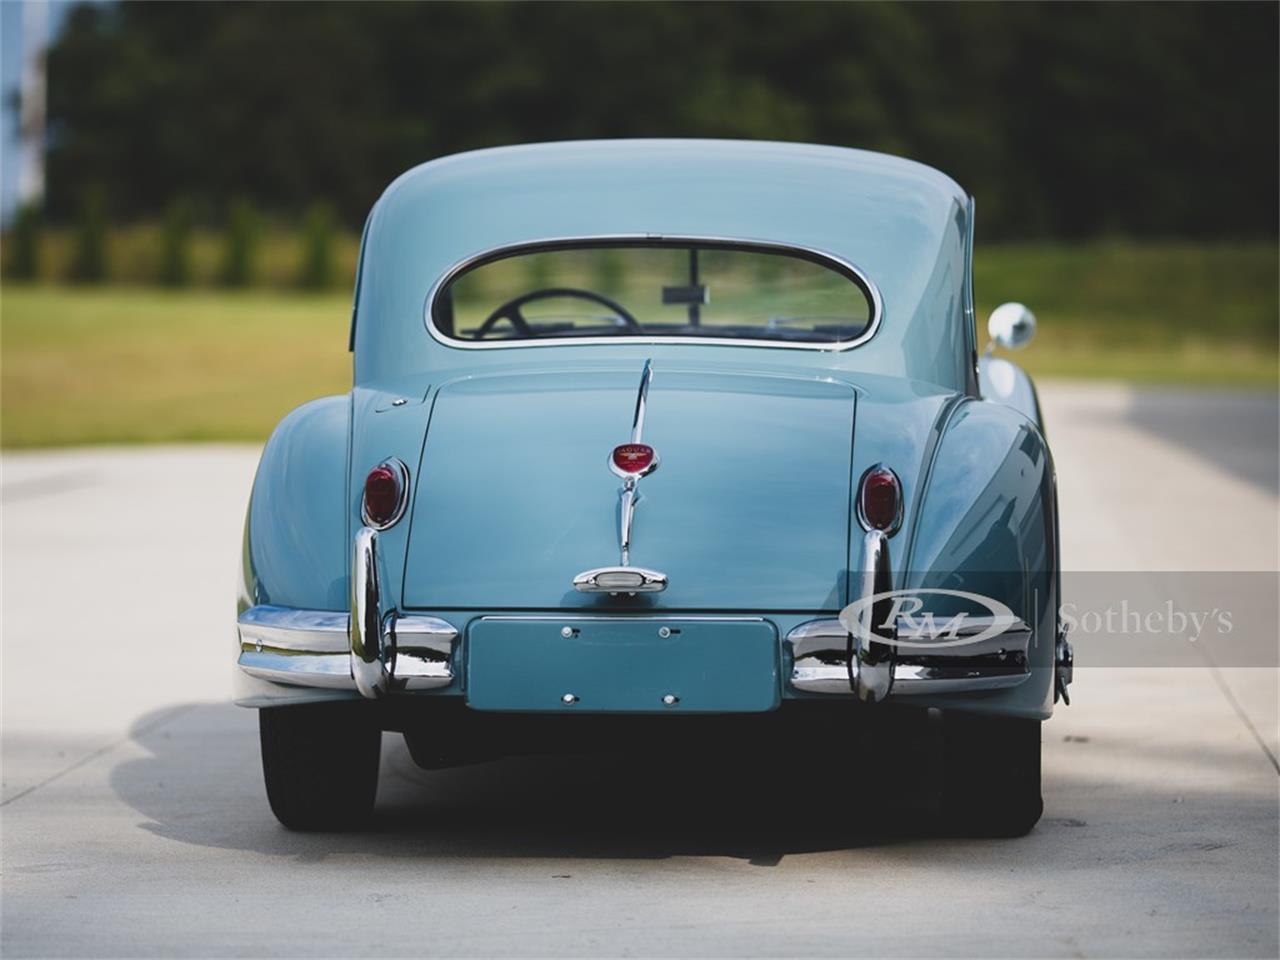 1955 Jaguar XK140 (CC-1336150) for sale in Elkhart, Indiana